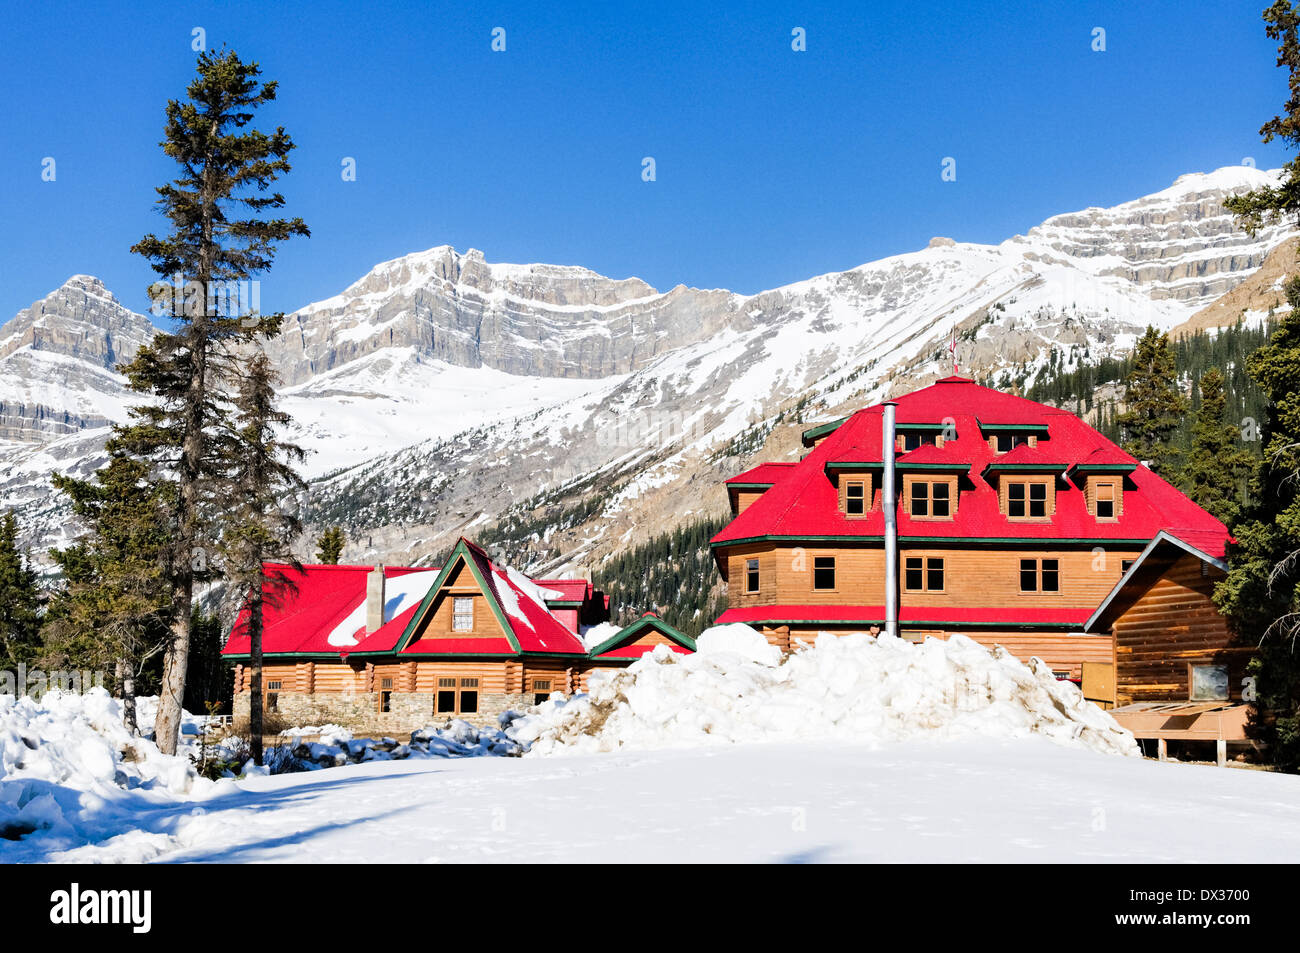 Num ti jah Lodge, Bow Lake, Banff National Park, Alberta, Canada - Stock Image